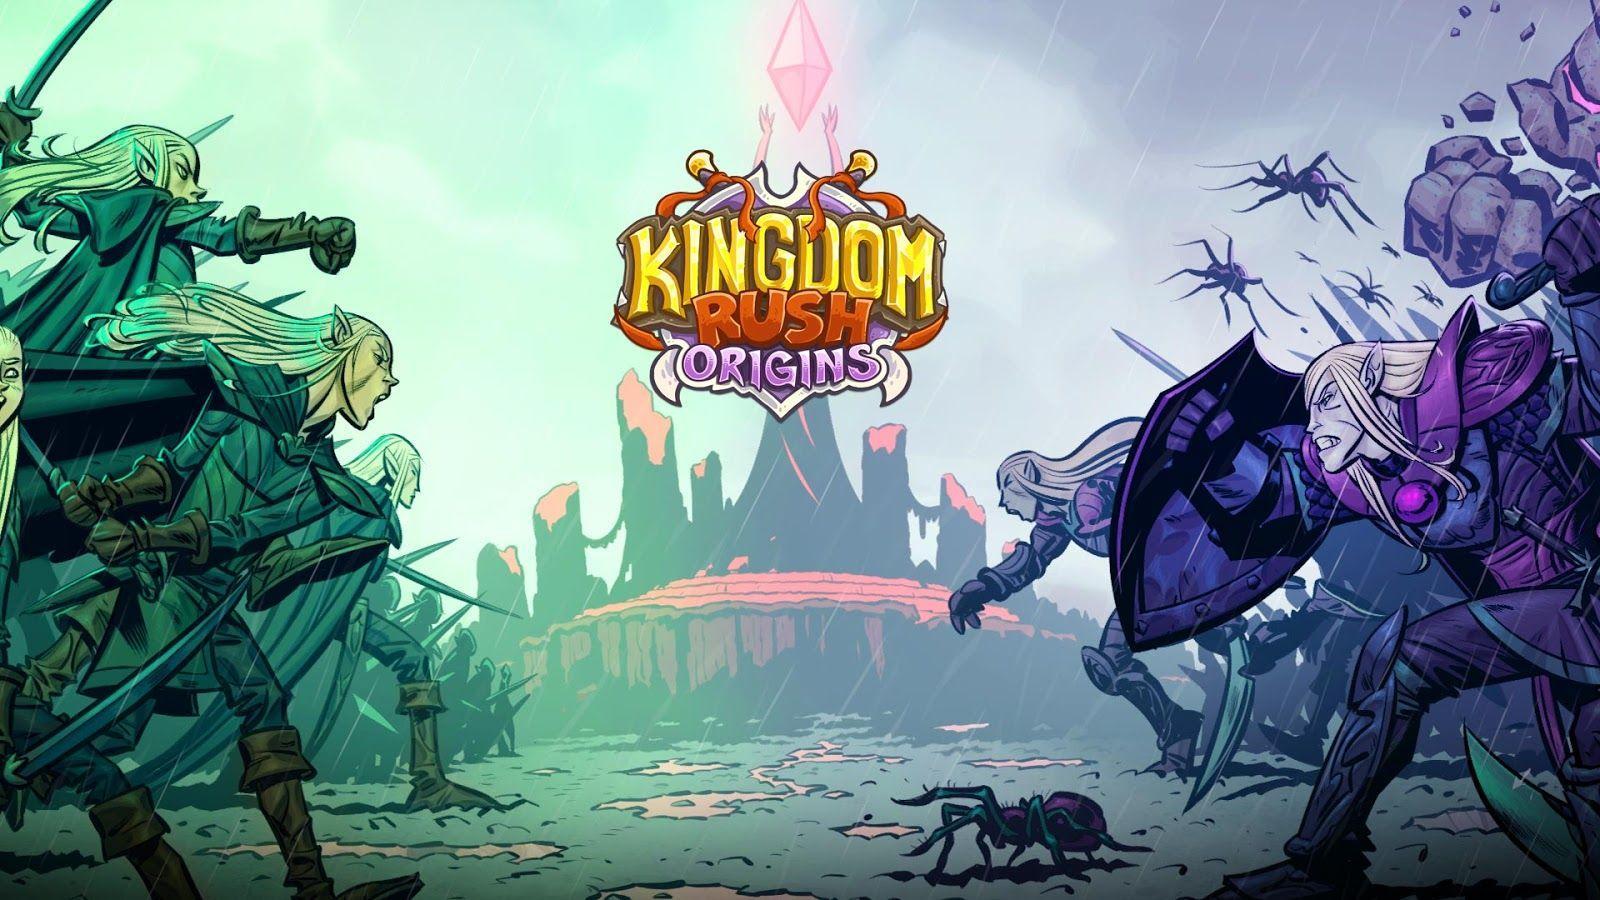 kingdom rush origins mod apk 2.0.4